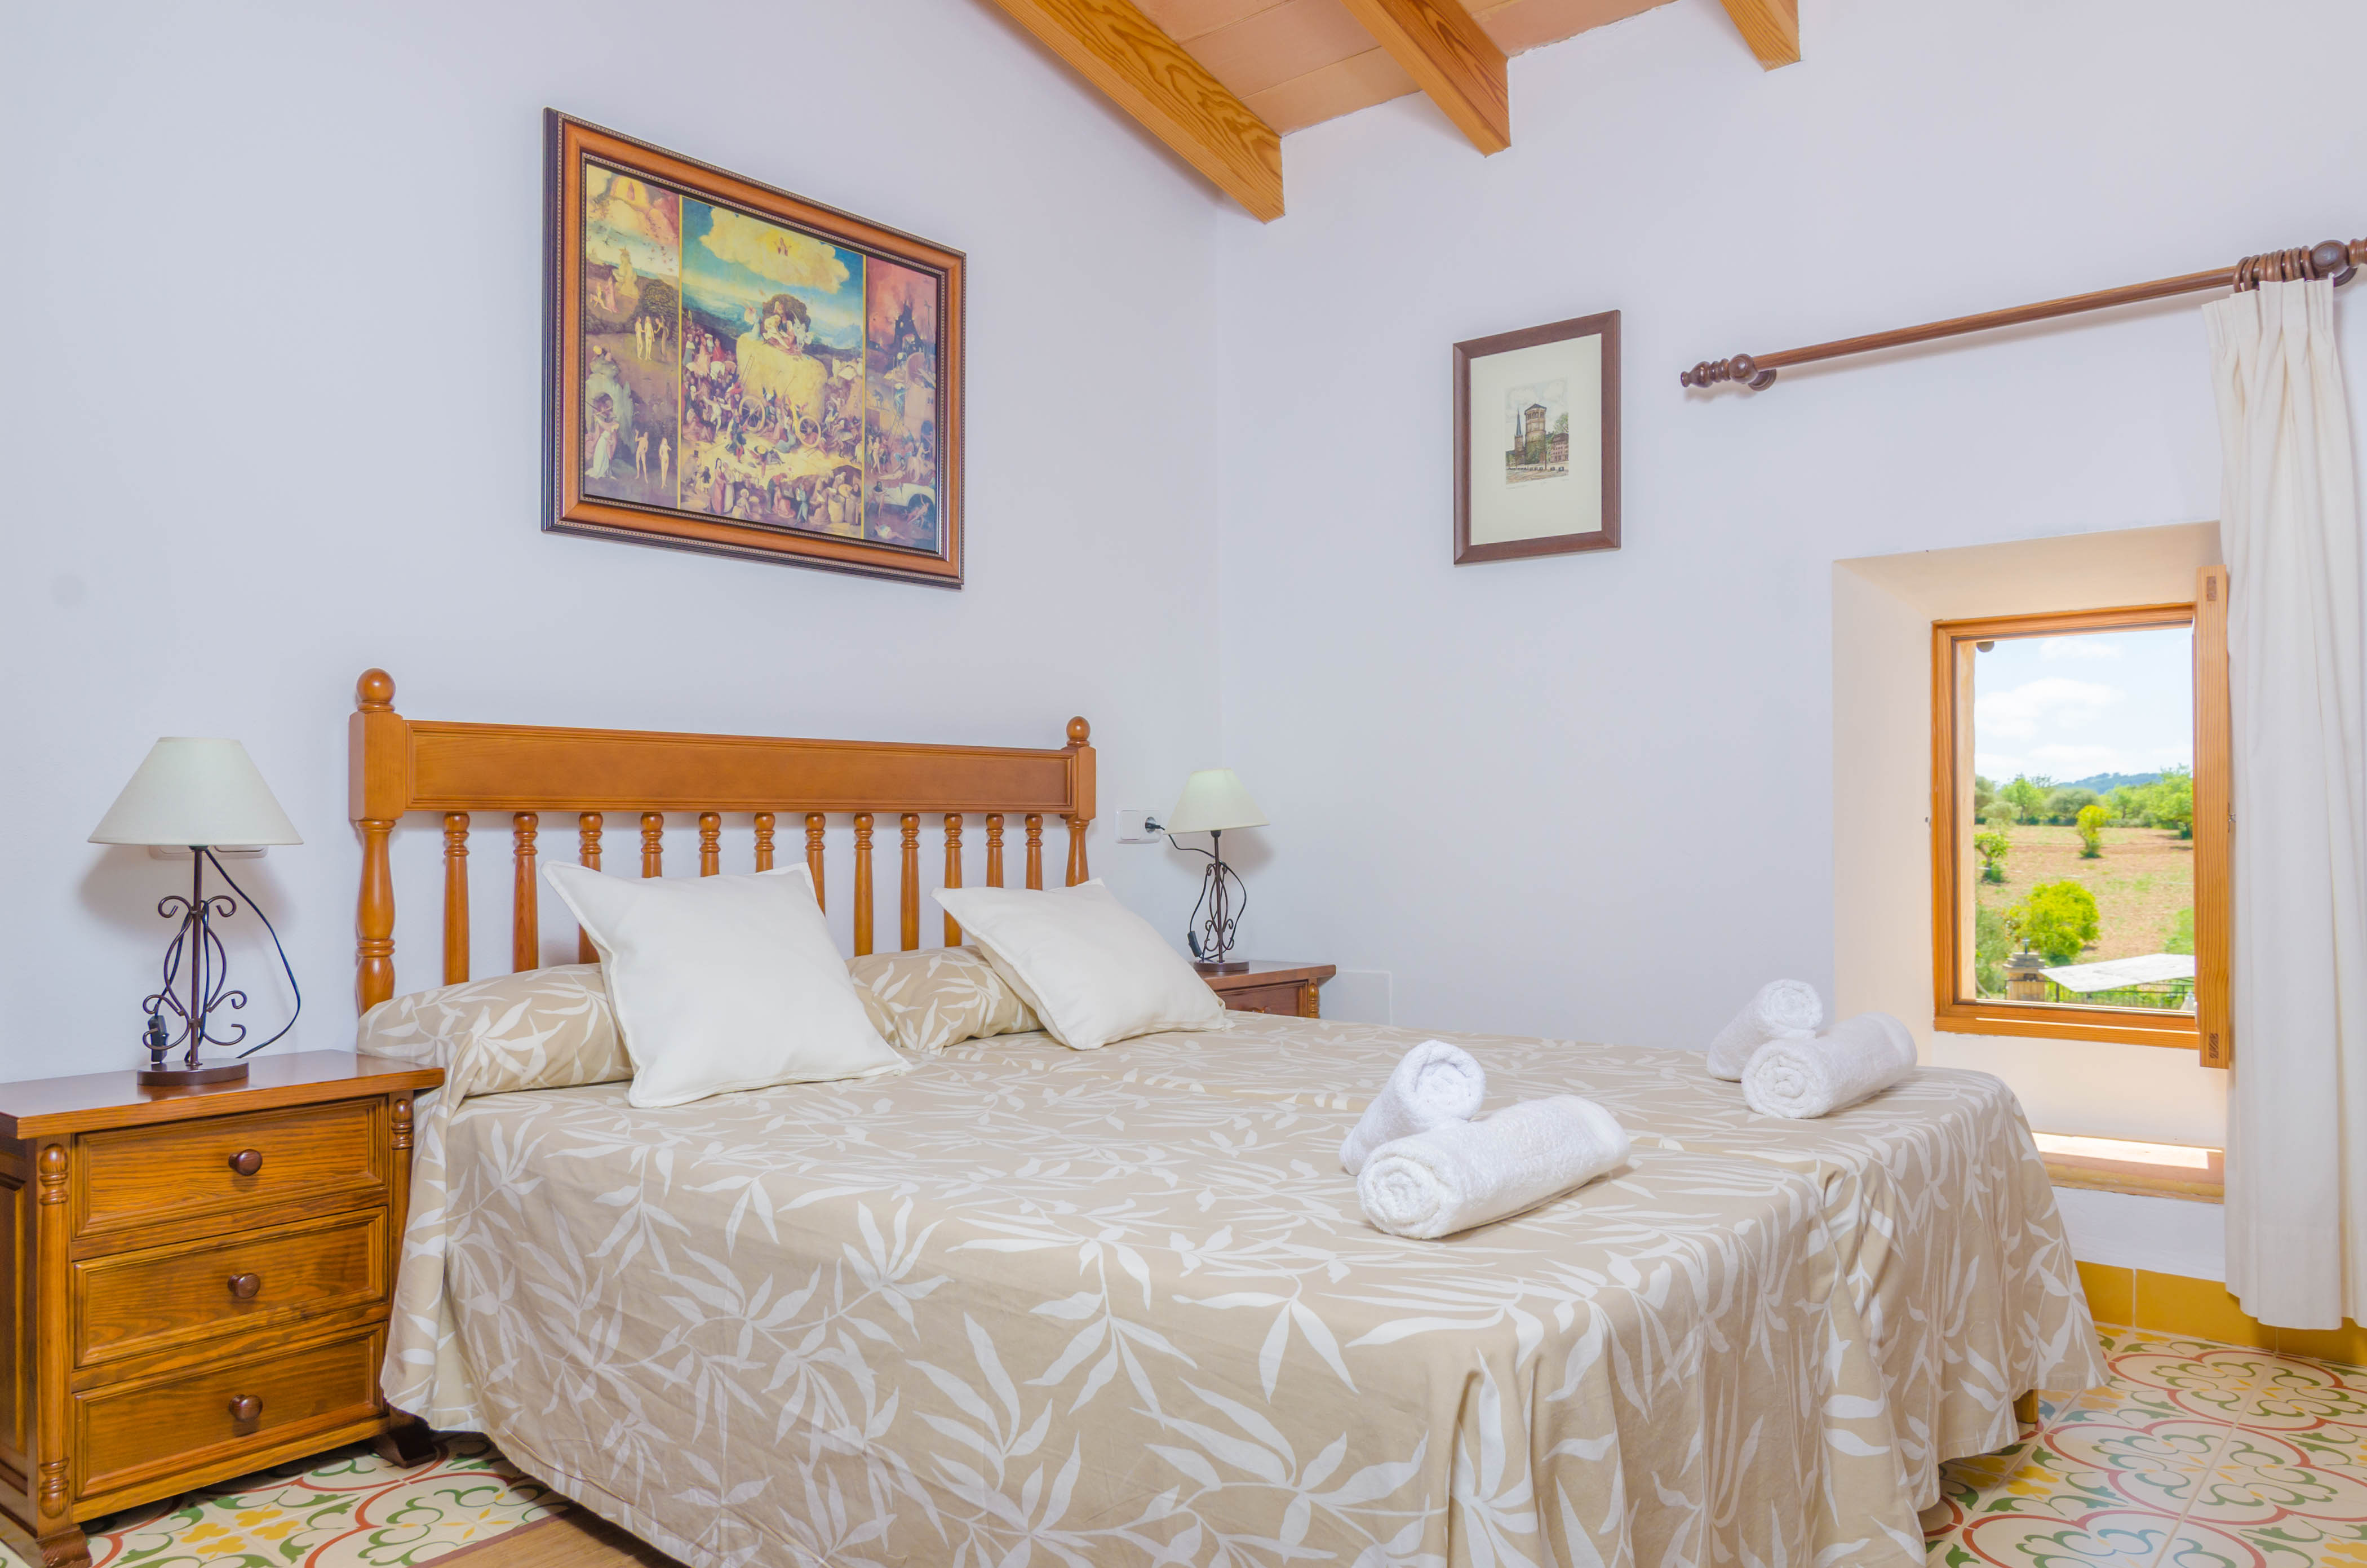 Ferienhaus SON MACIA (2186582), Son Macià, Mallorca, Balearische Inseln, Spanien, Bild 41